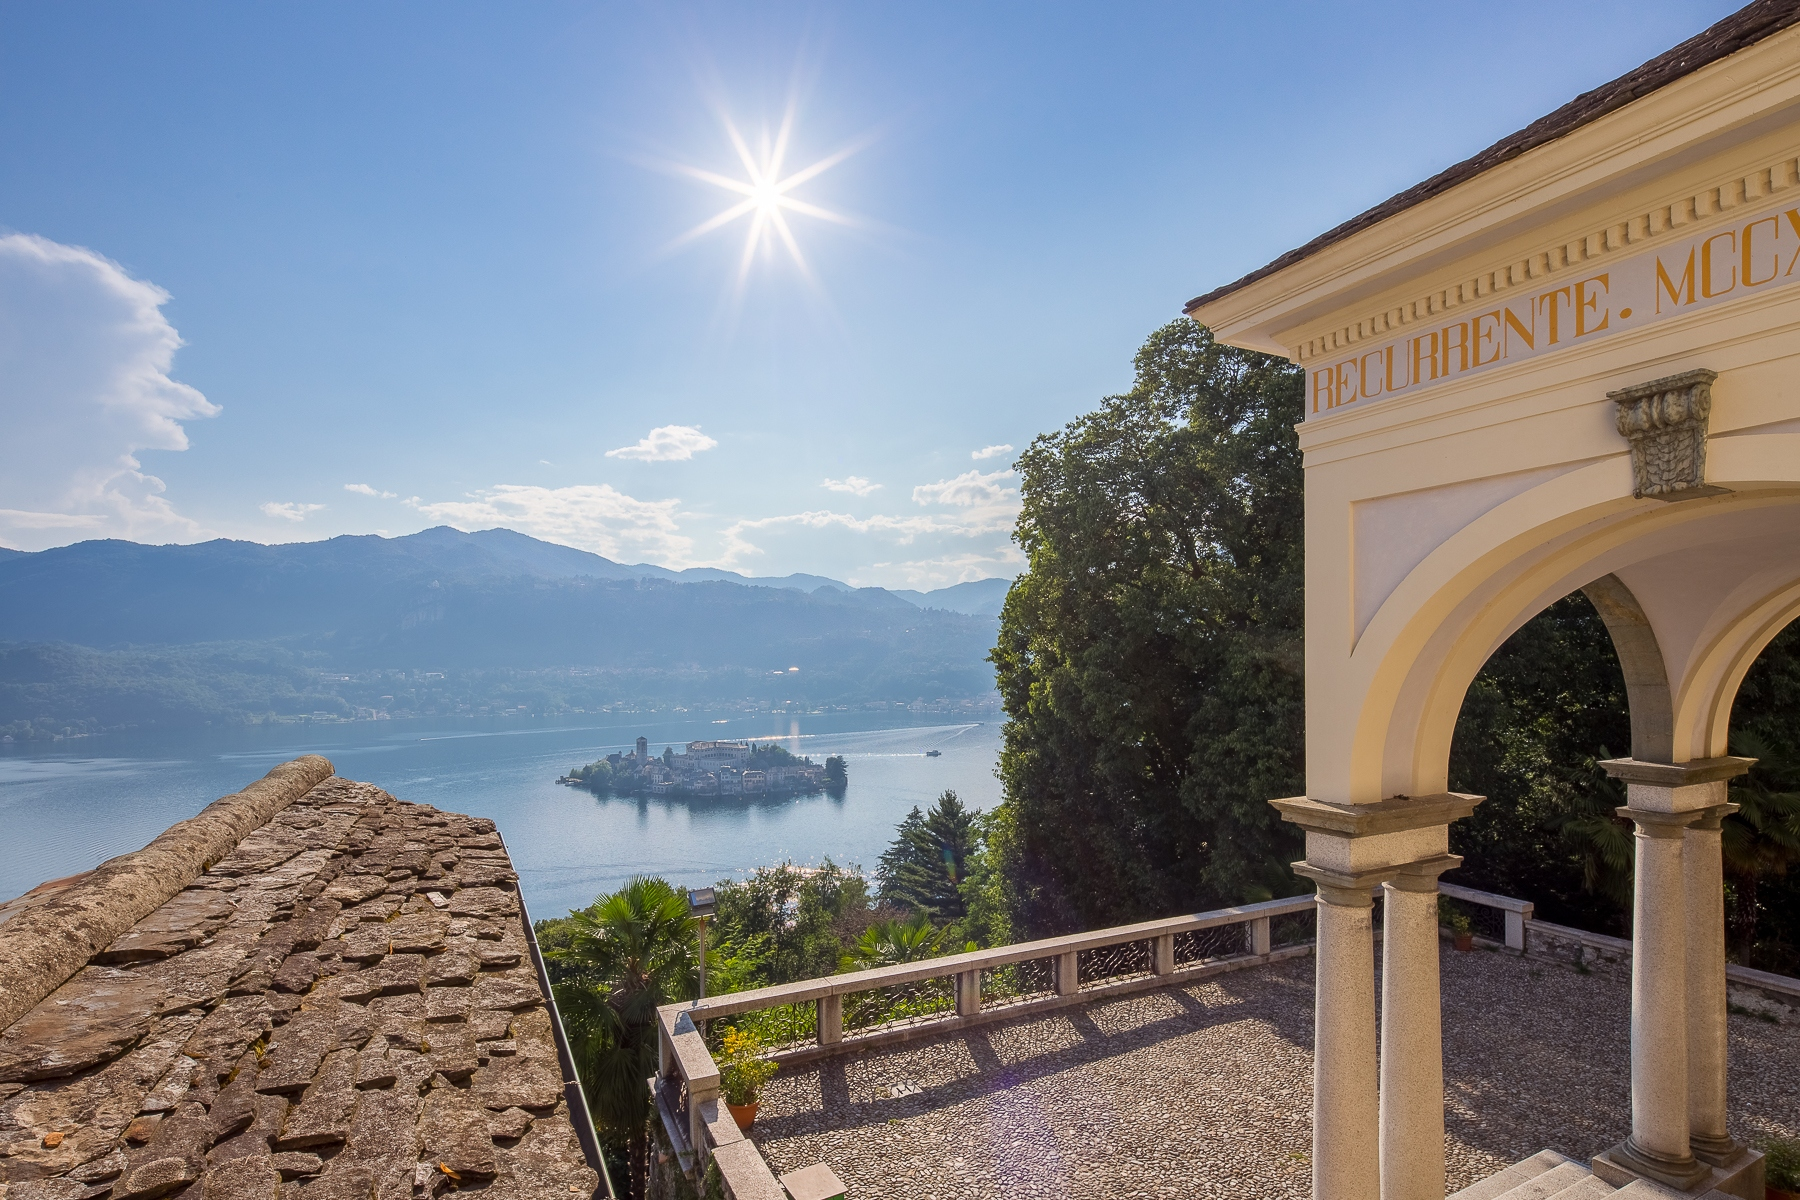 Property for Sale at Ex-Convent and 19c Villa on the Sacro Monte - Orta San Giulio Orta San Giulio, Novara Italy